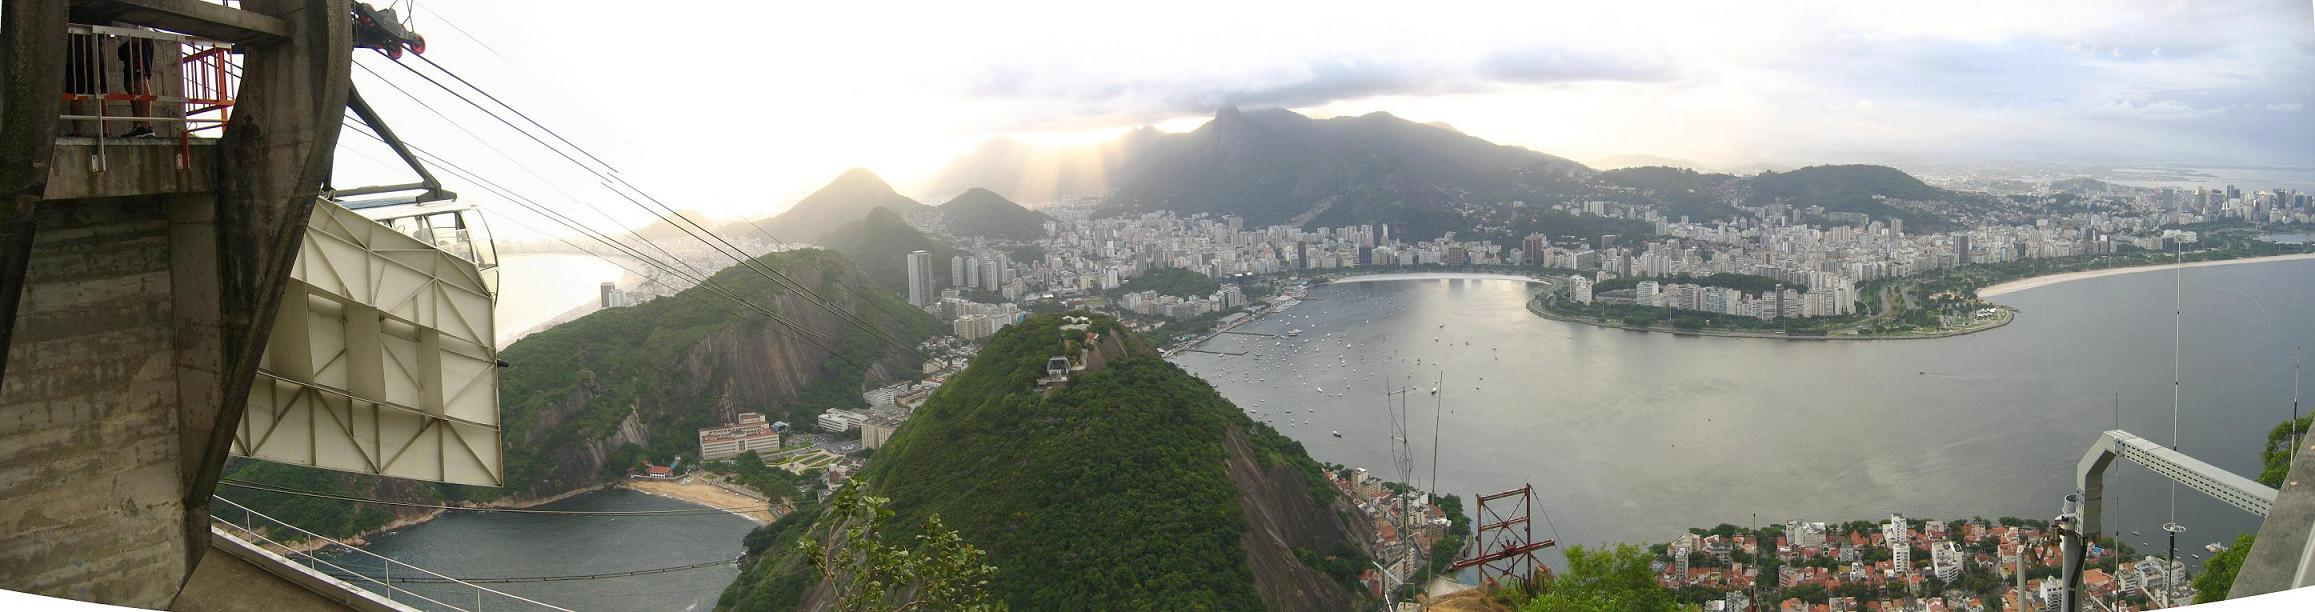 Brazil_rio3